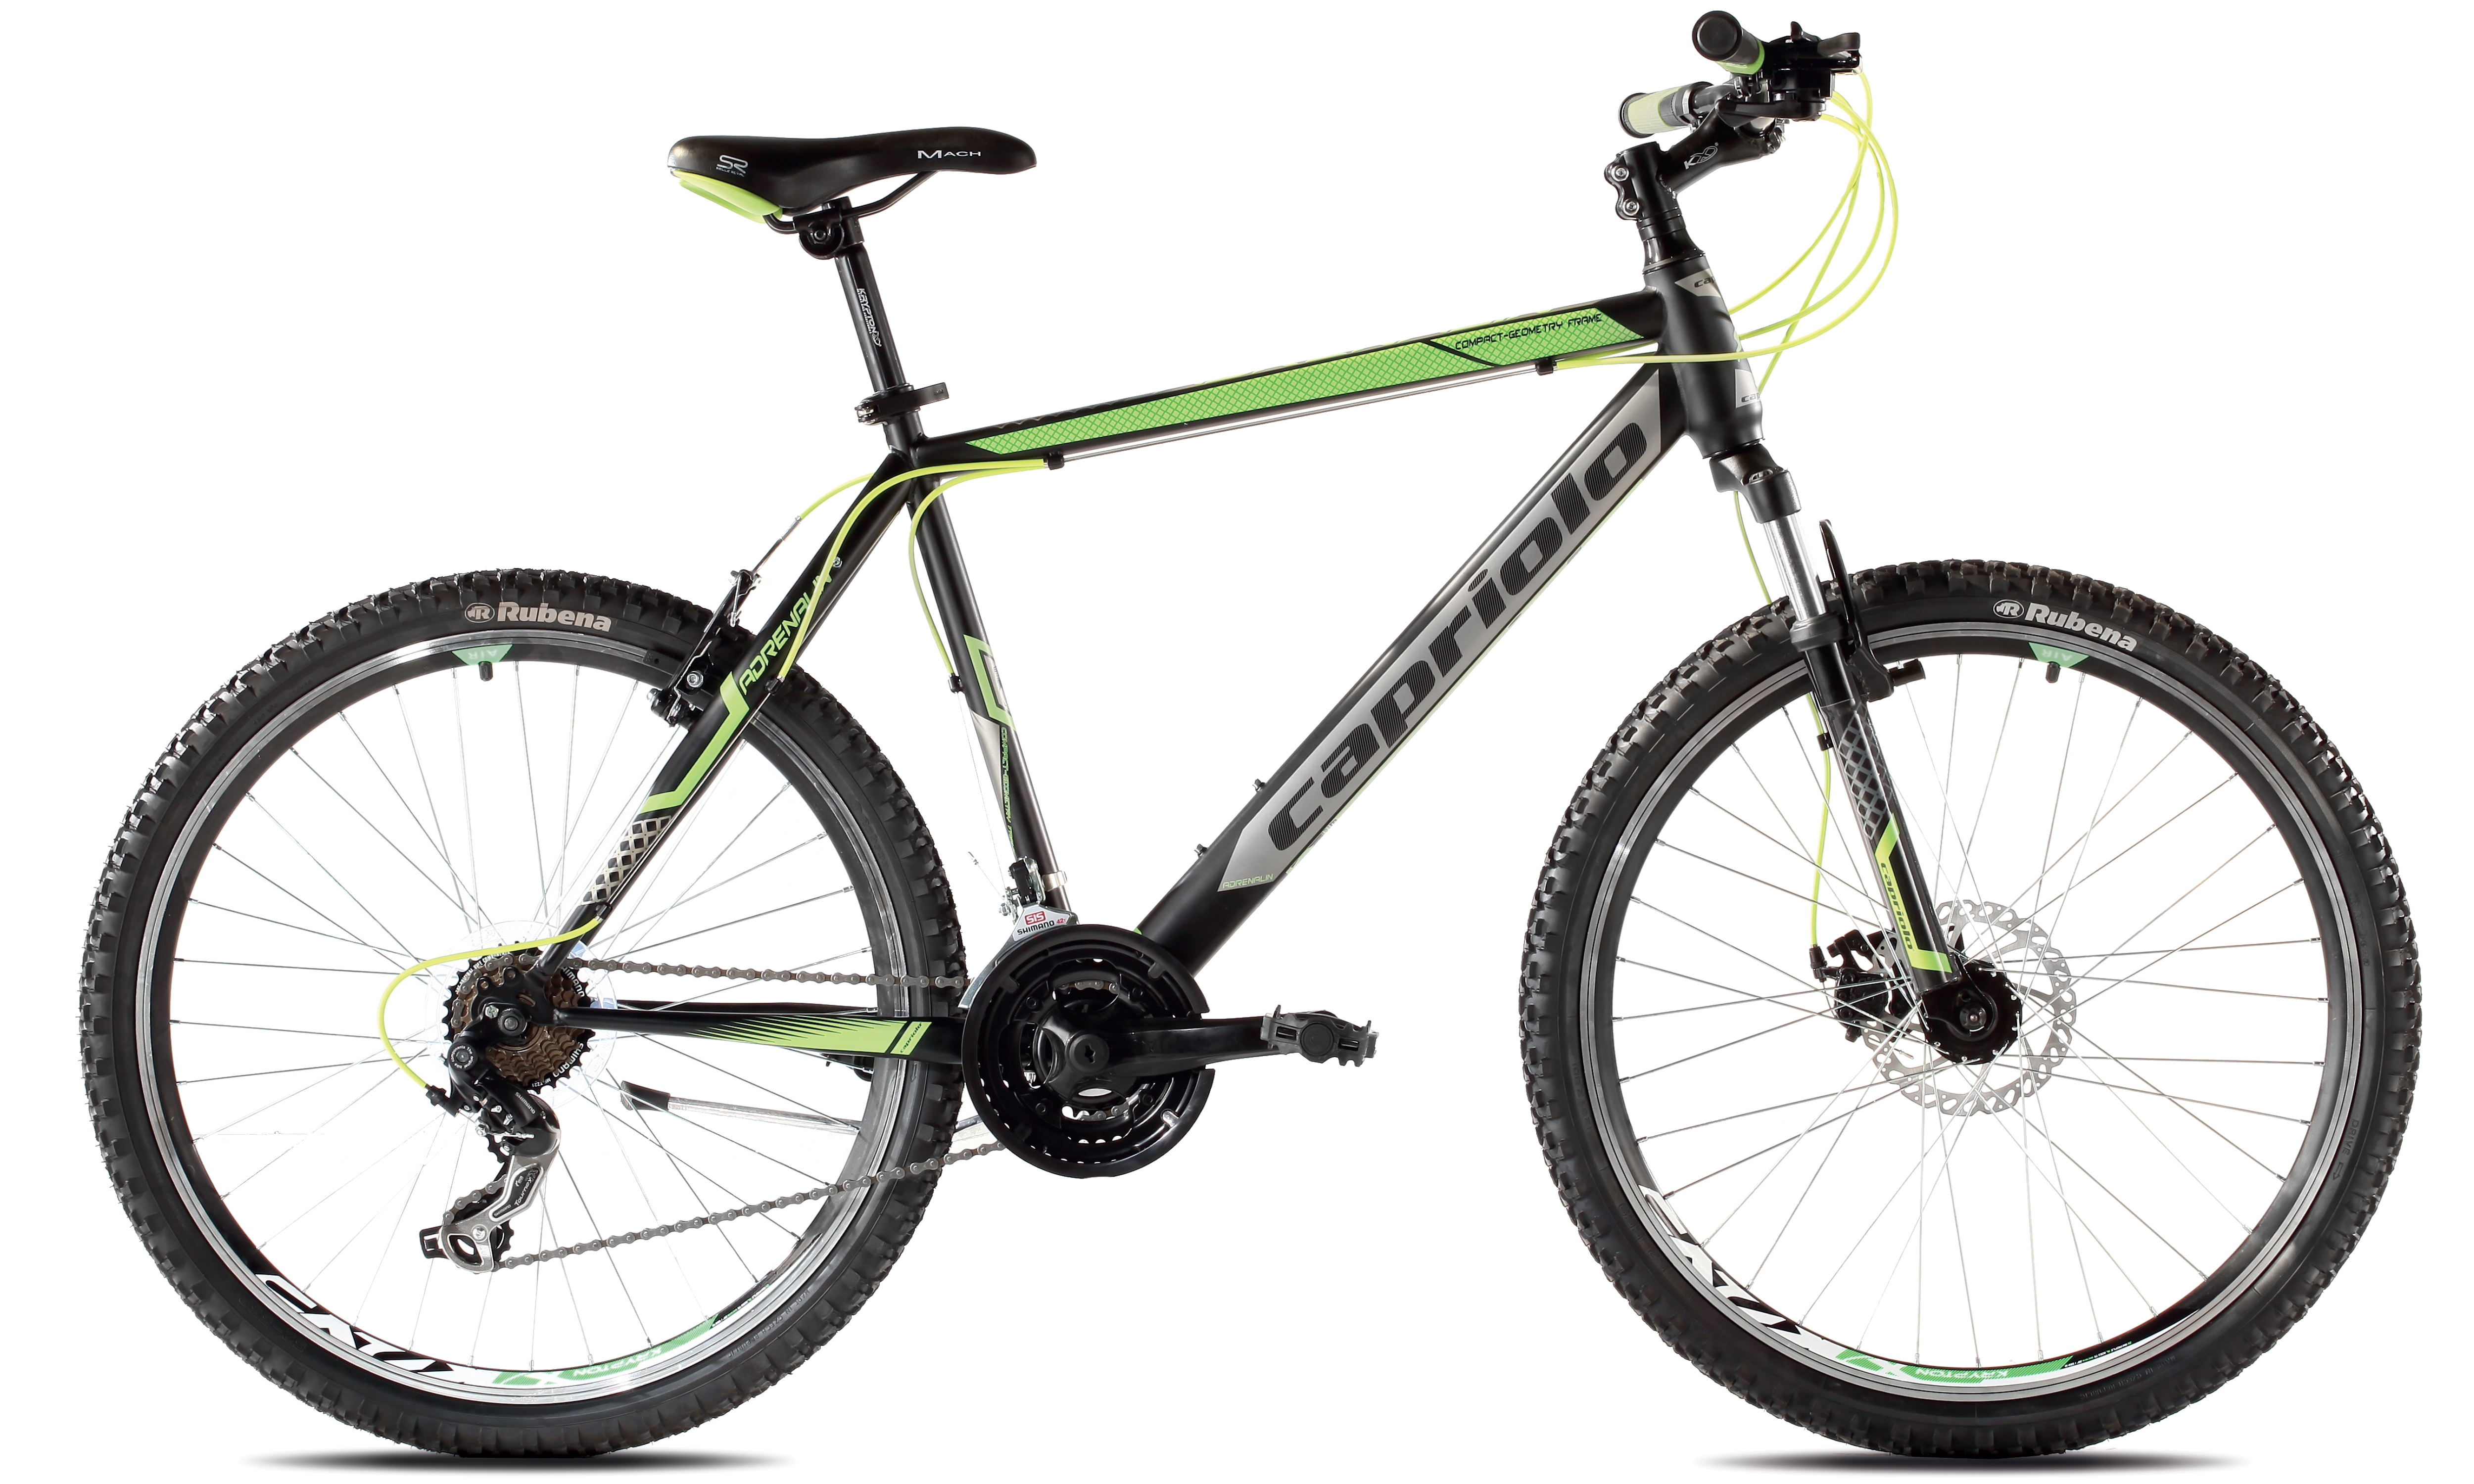 bicikl-capriolo-adrenalin-26-zelano-crna-2016-20